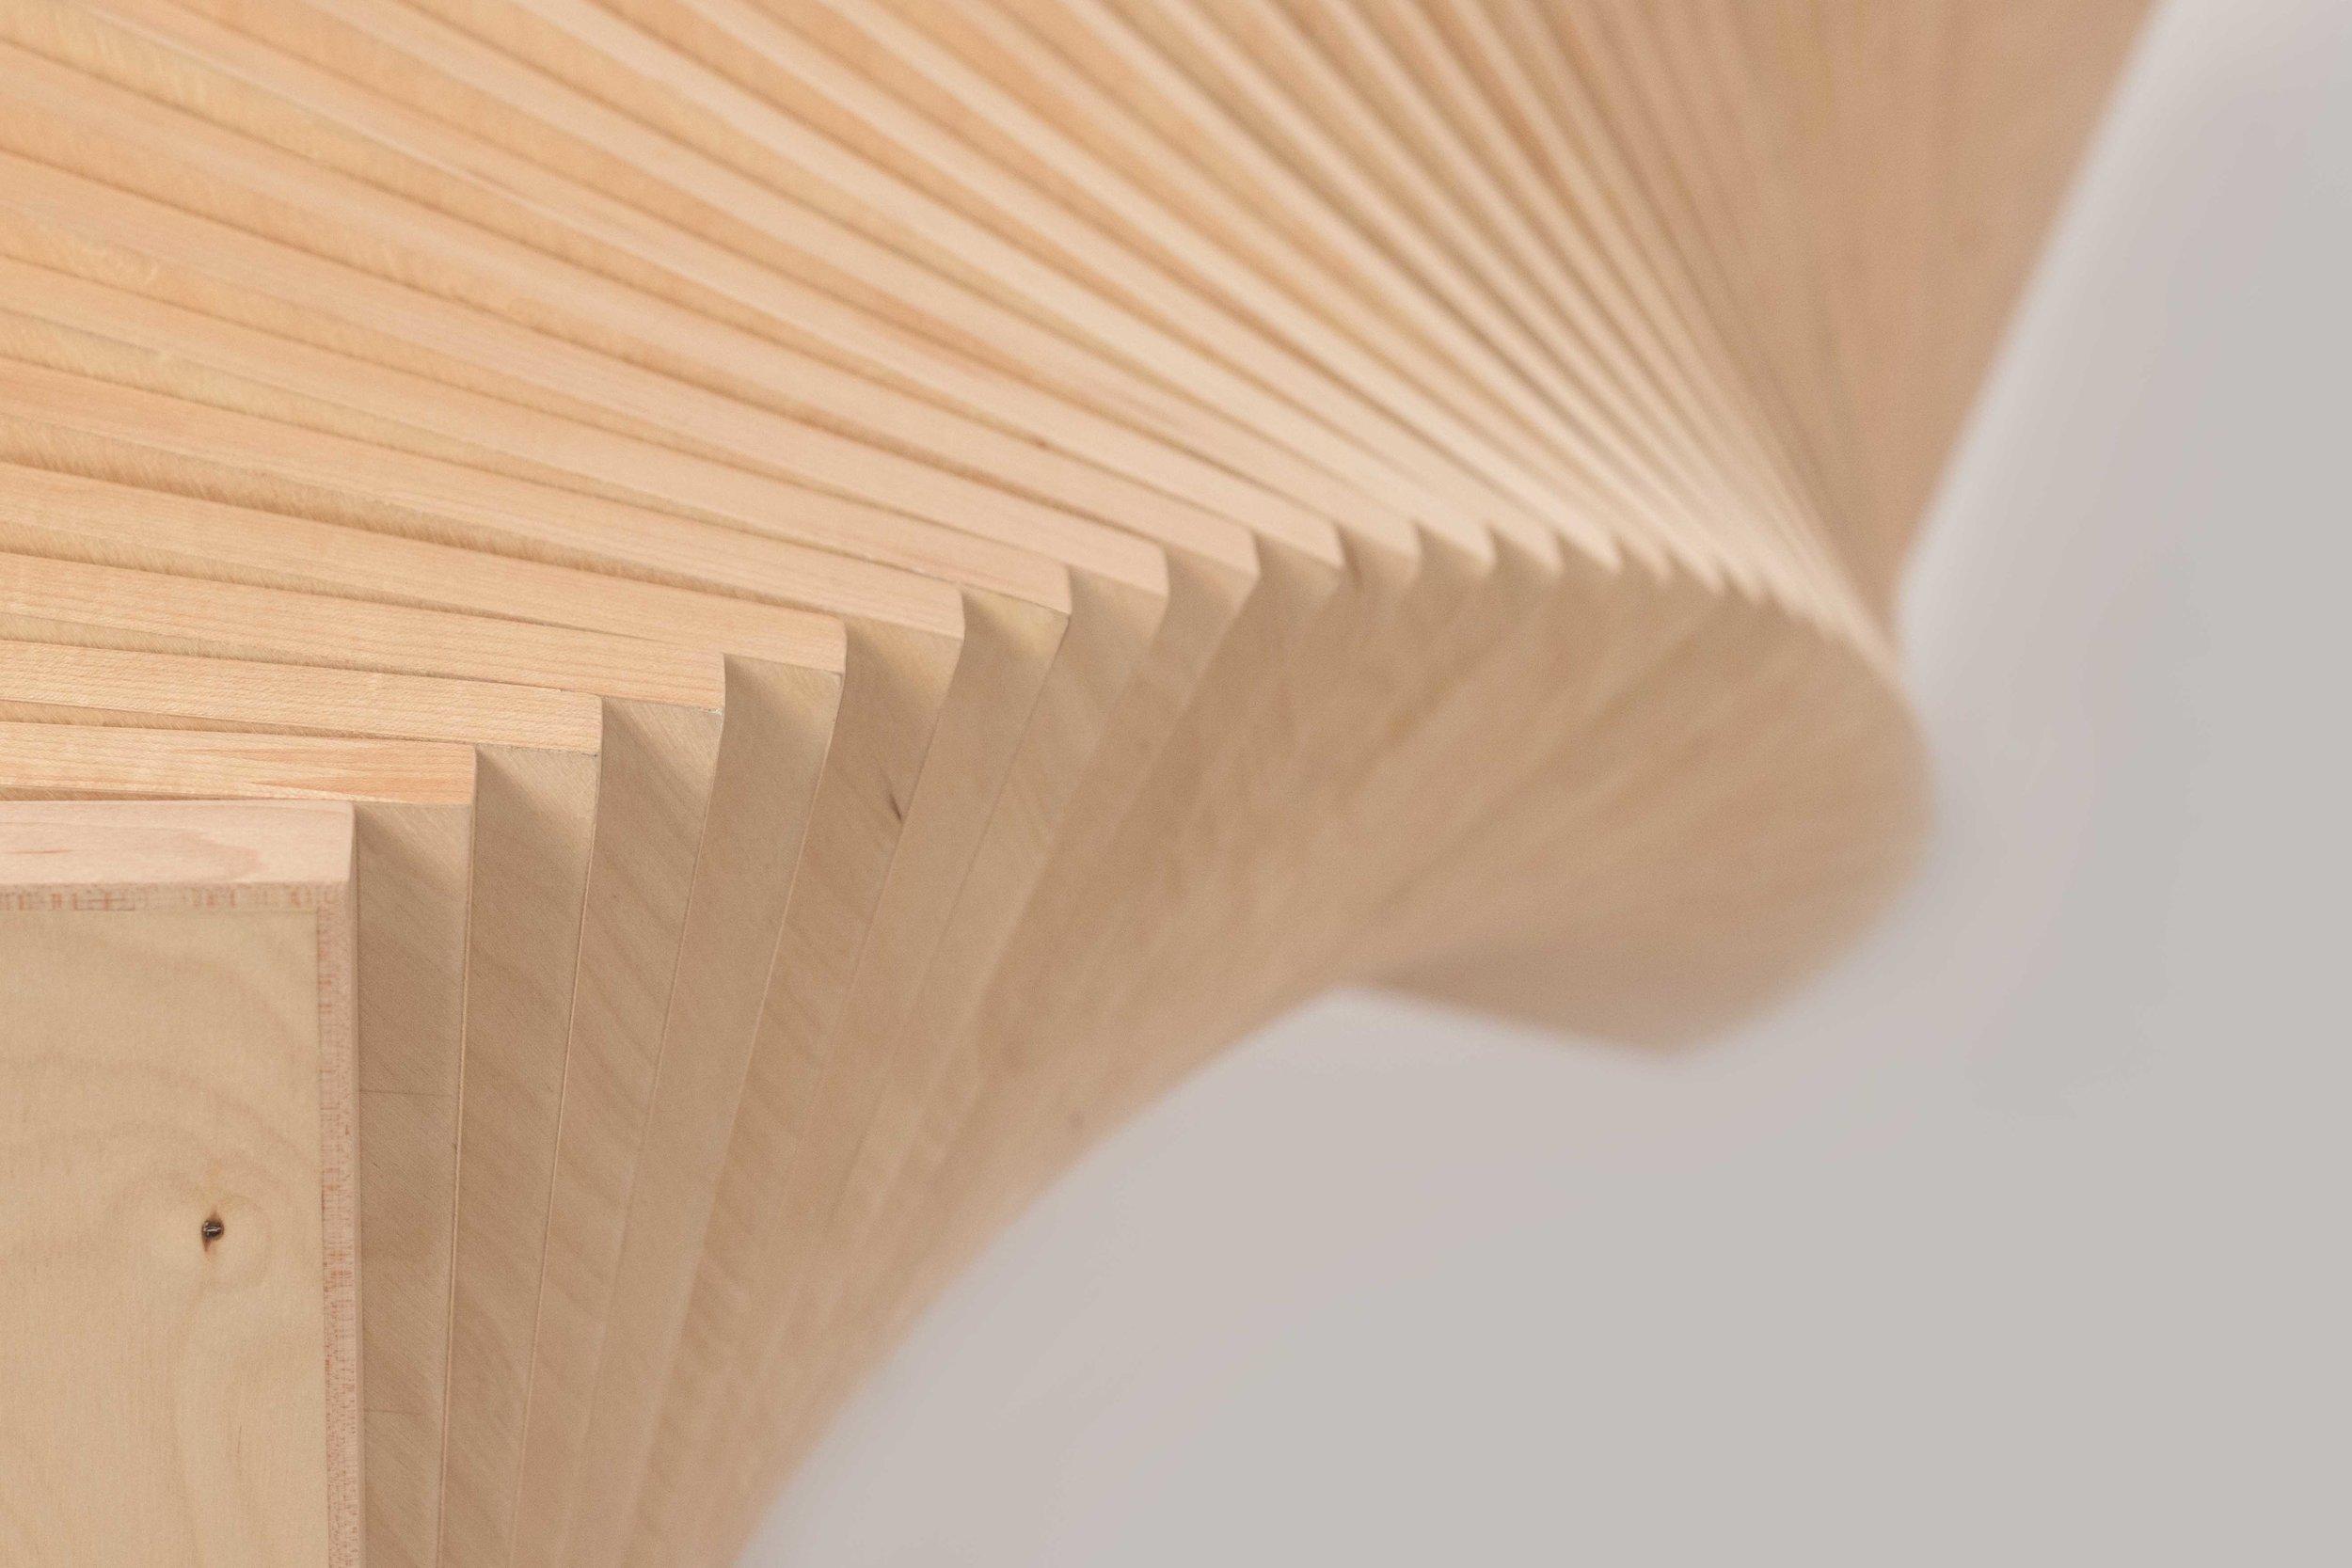 maple wave detail 4 low.jpg